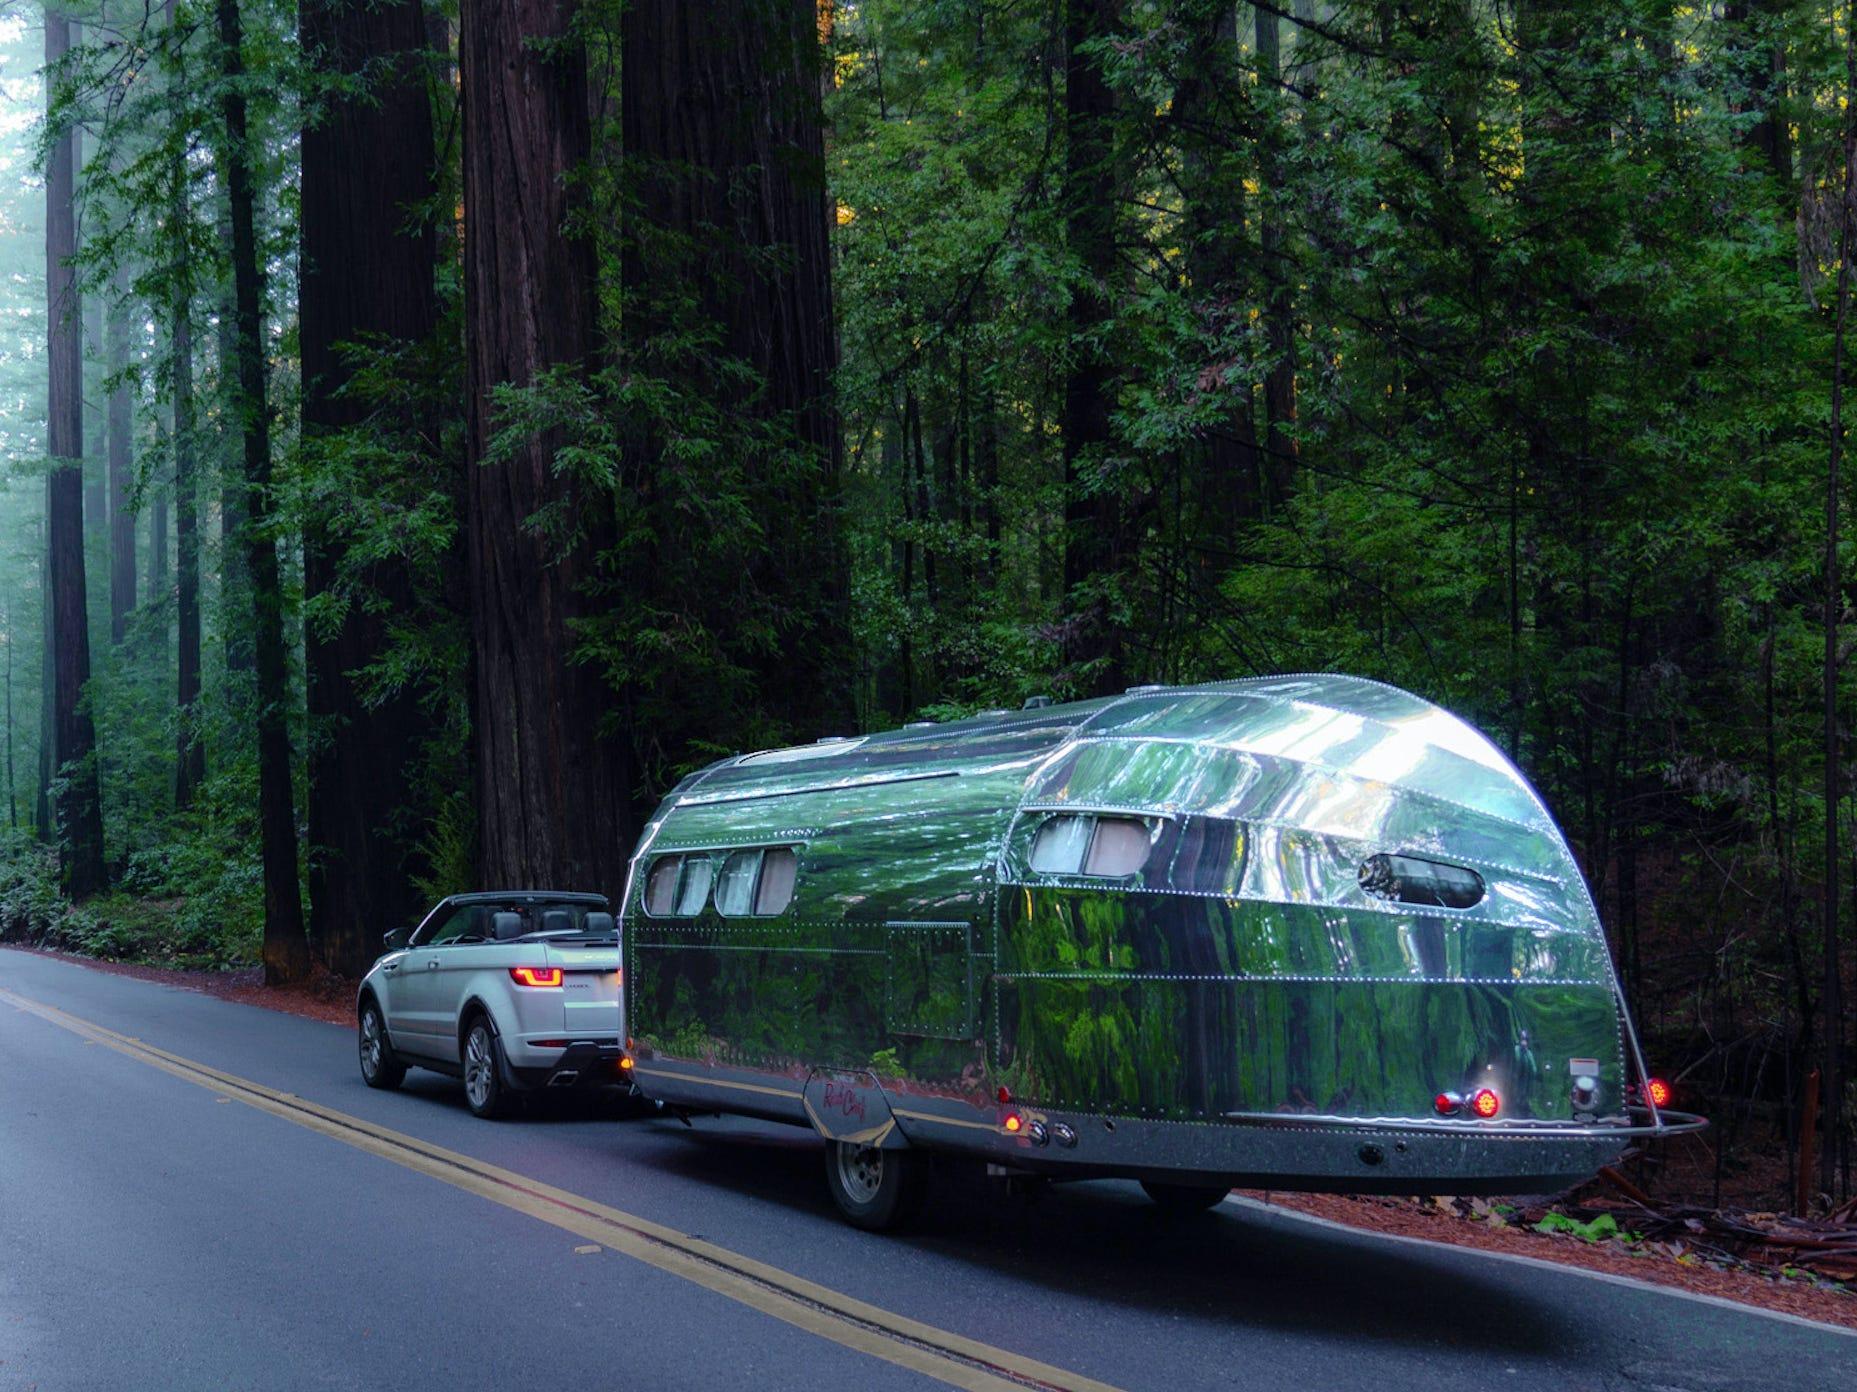 bowlus terra firma travel trailer